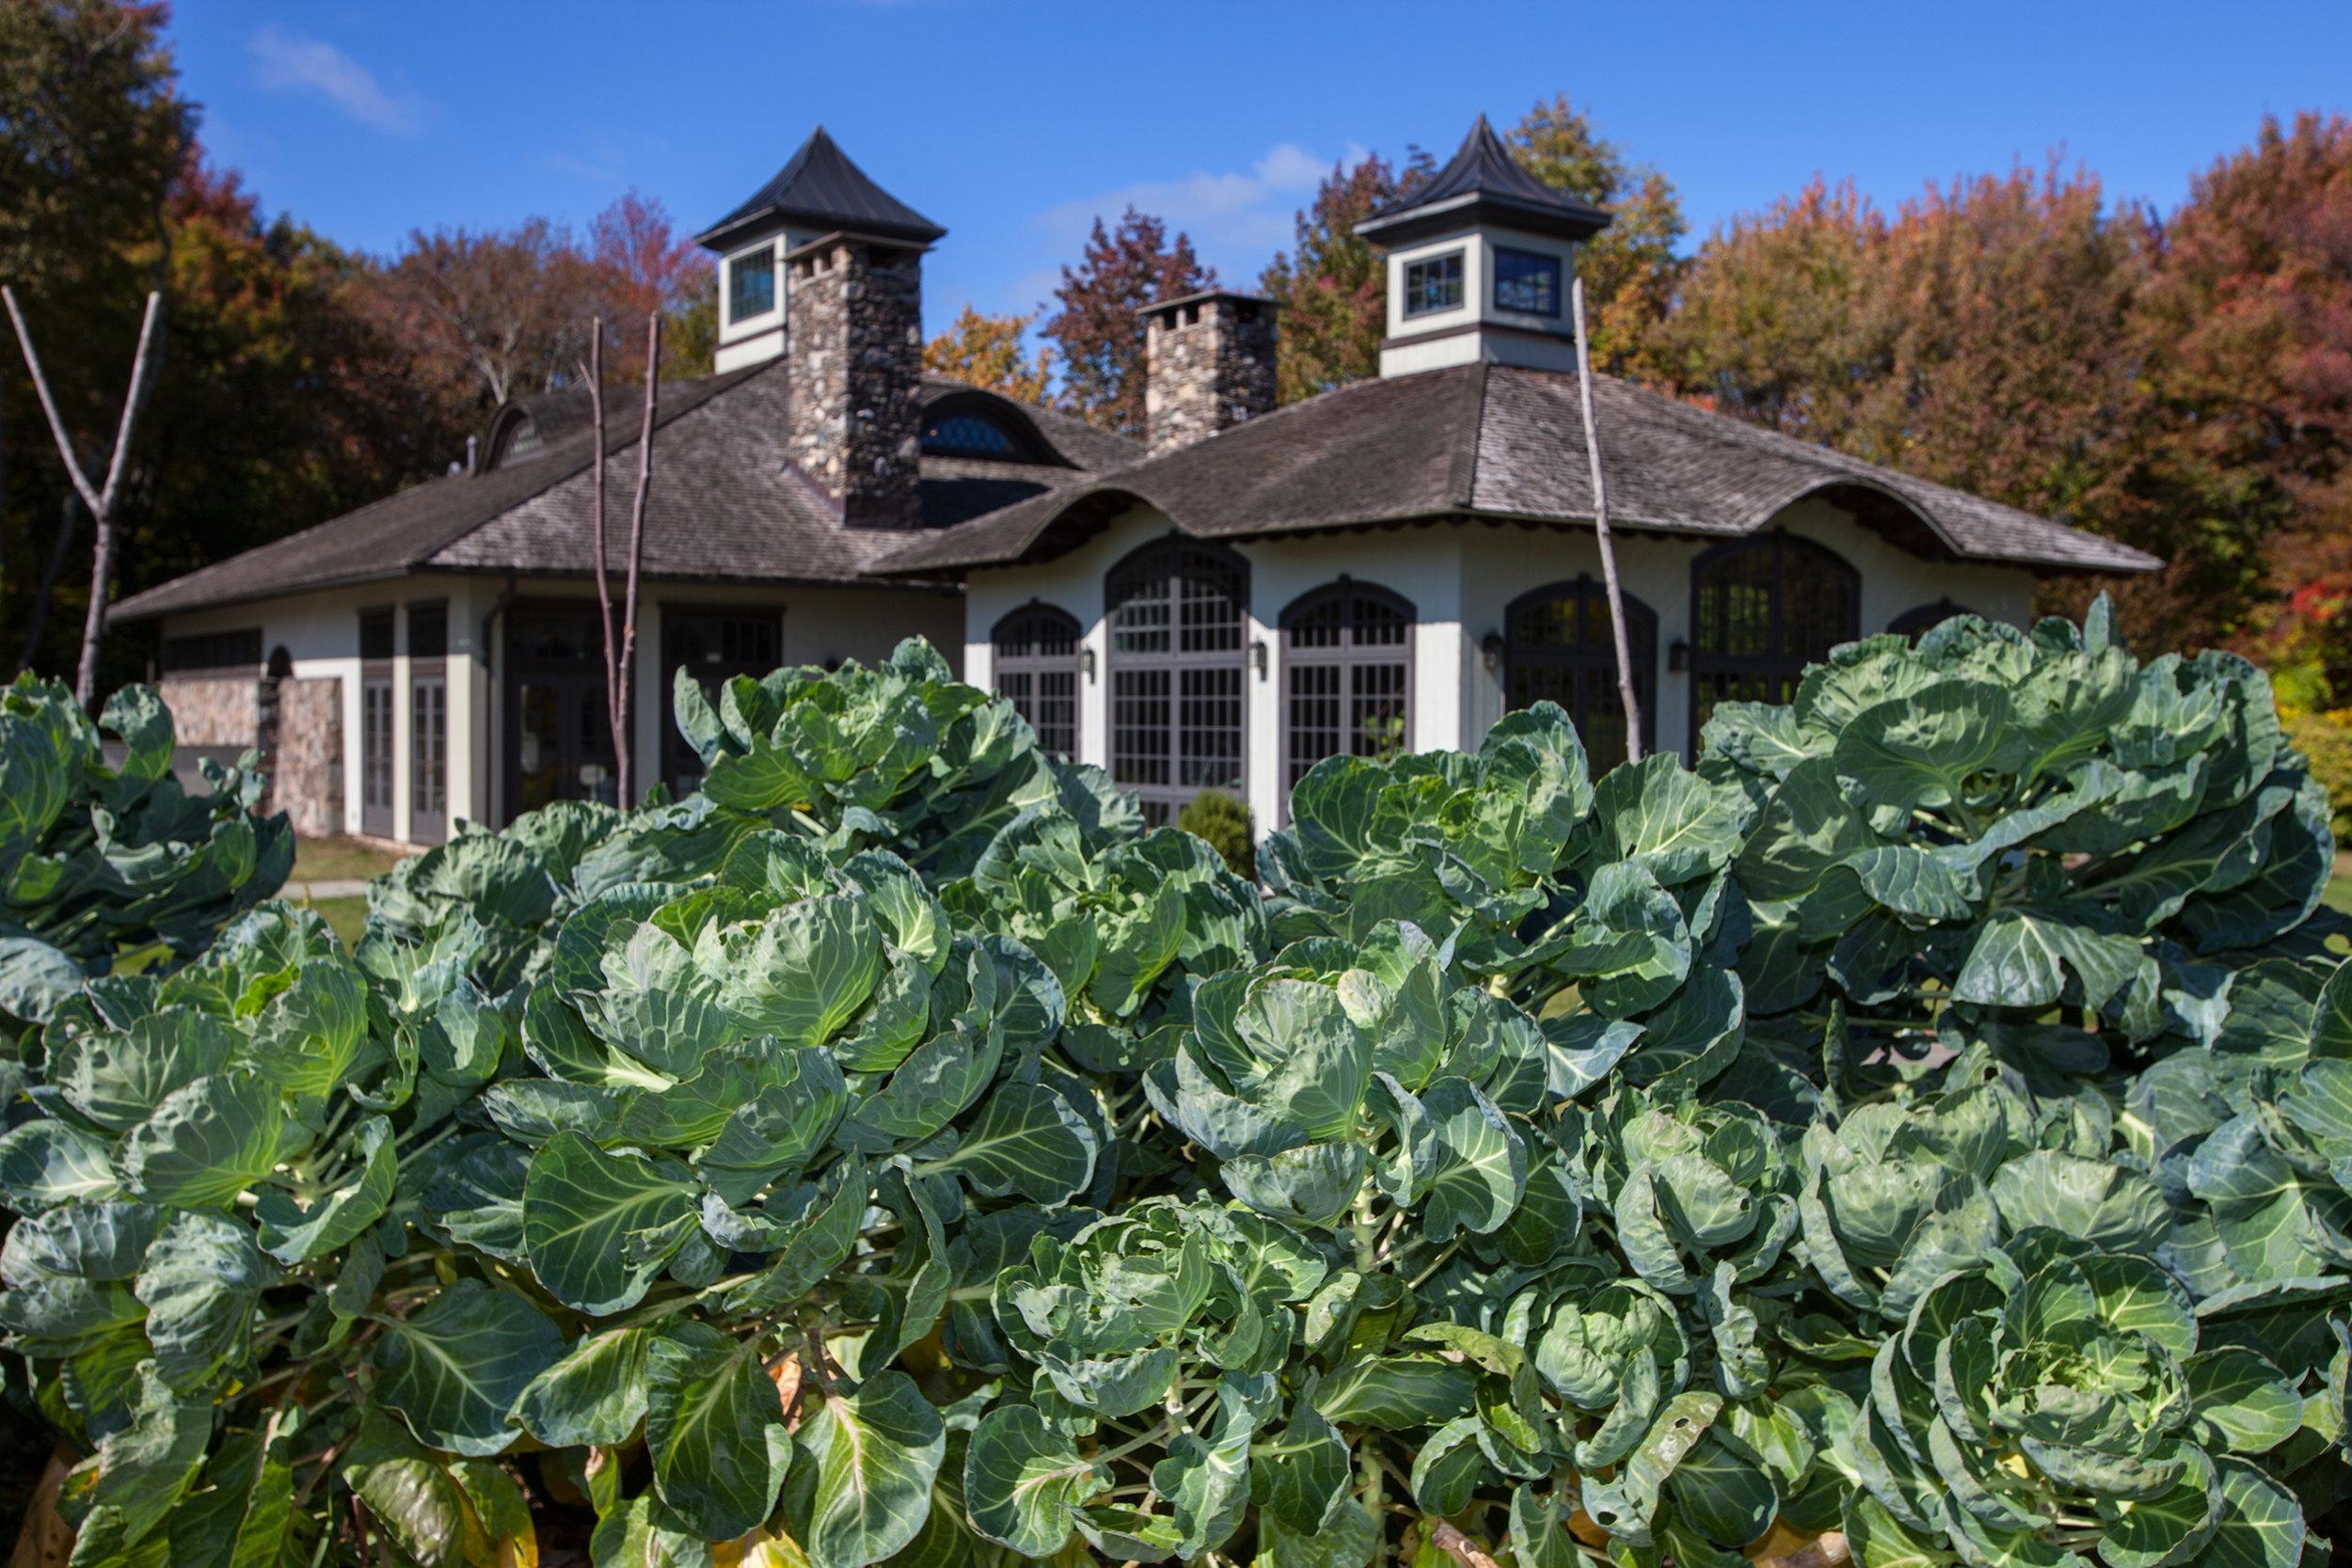 WINVIAN-FARM-CT-GARDEN-LANDSCAPE-©-JONATHAN-R.-BECKERMAN-PHOTOGRAPHY-100715_-483.jpg